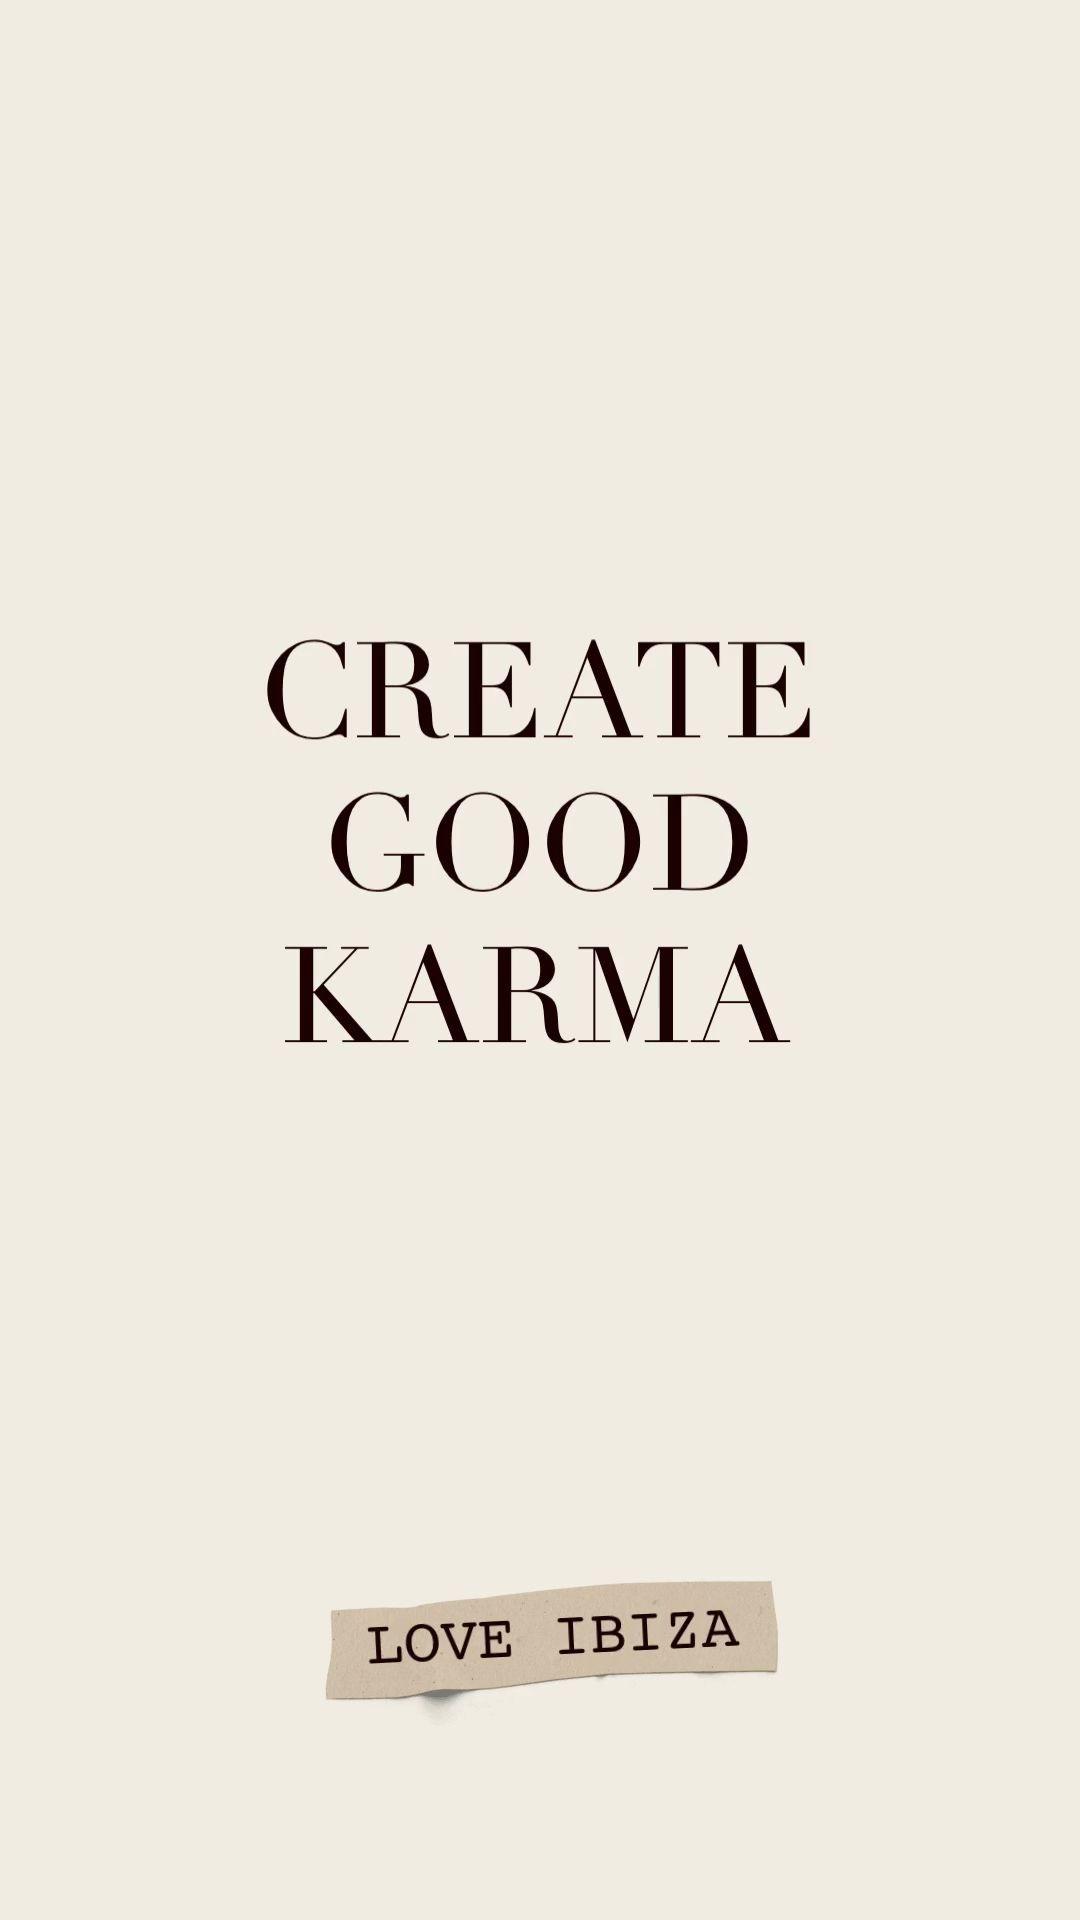 Create good karma – motivational quote